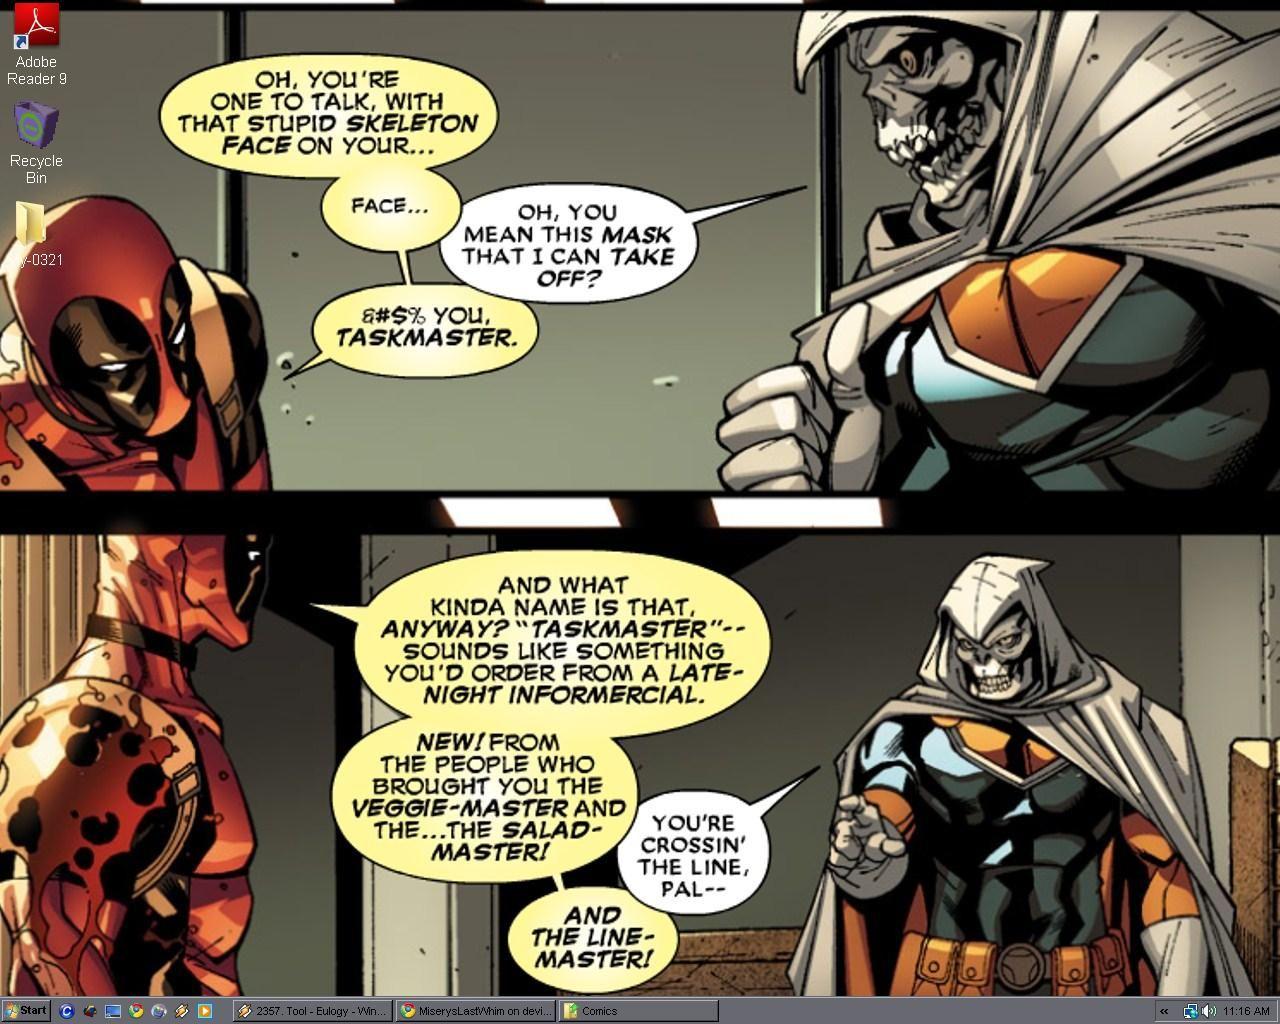 Deadpool Taskmaster Desktop By Miseryslastwhim On Deviantart Deadpool Comic Deadpool Quotes Deadpool Funny